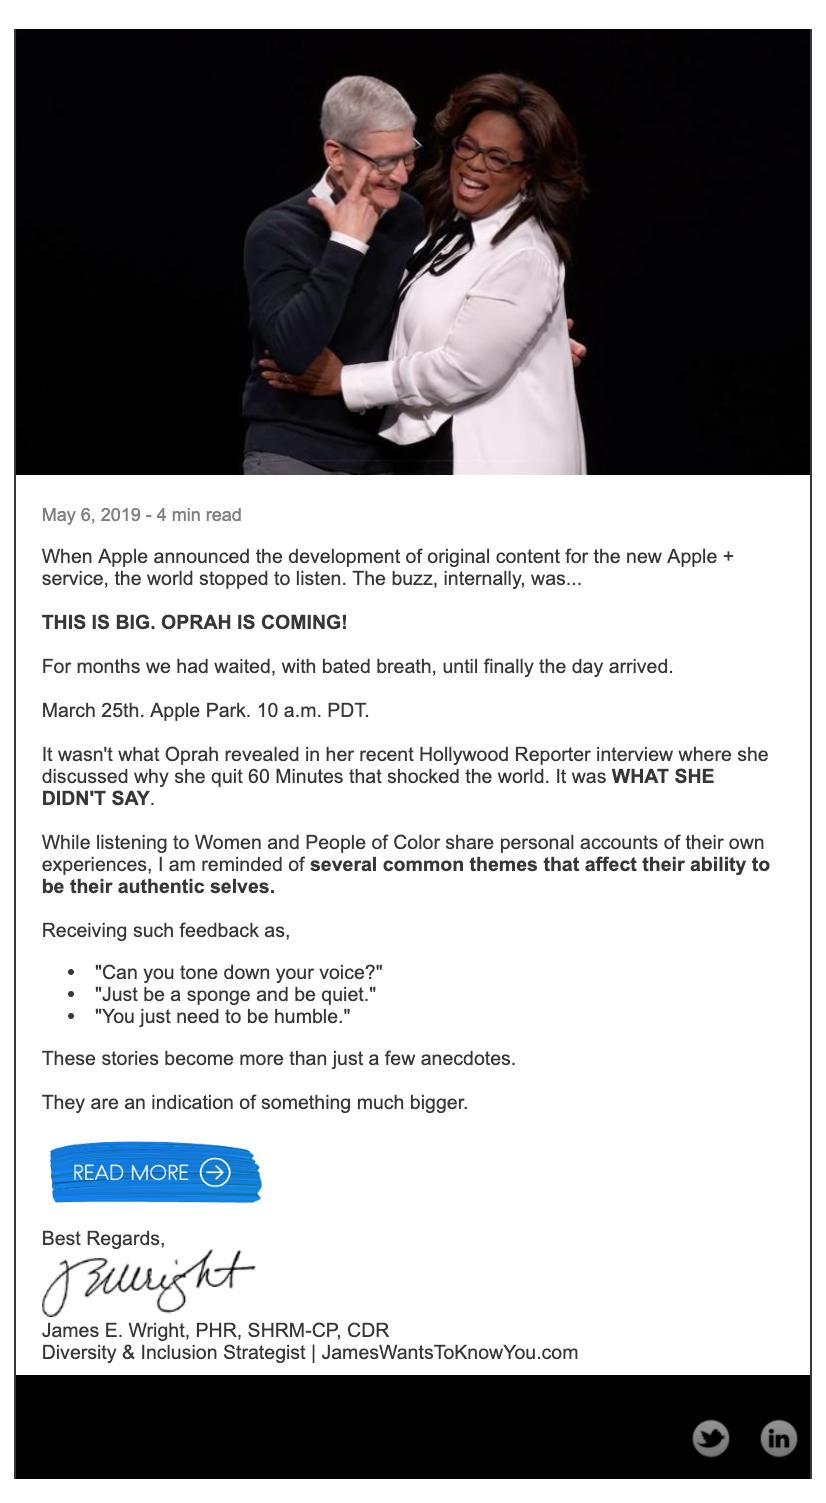 What Oprah Didn't Say Article